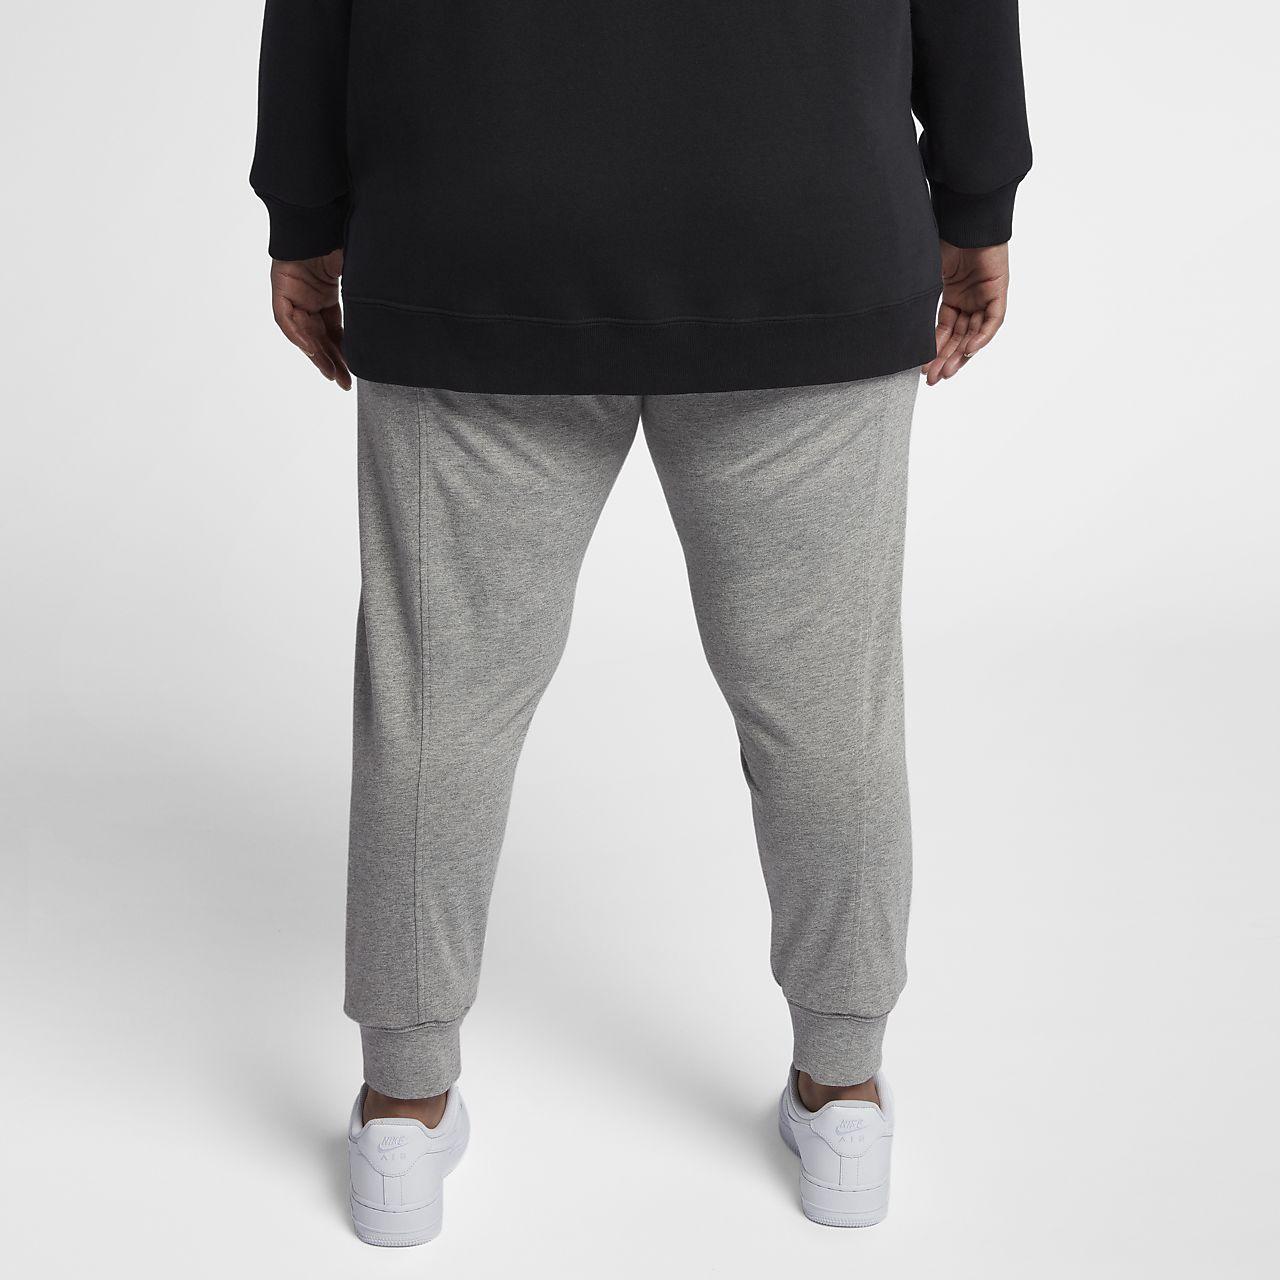 60d8a022b4d Nike Sportswear Gym Classic (Plus Size) Women s Pants. Nike.com